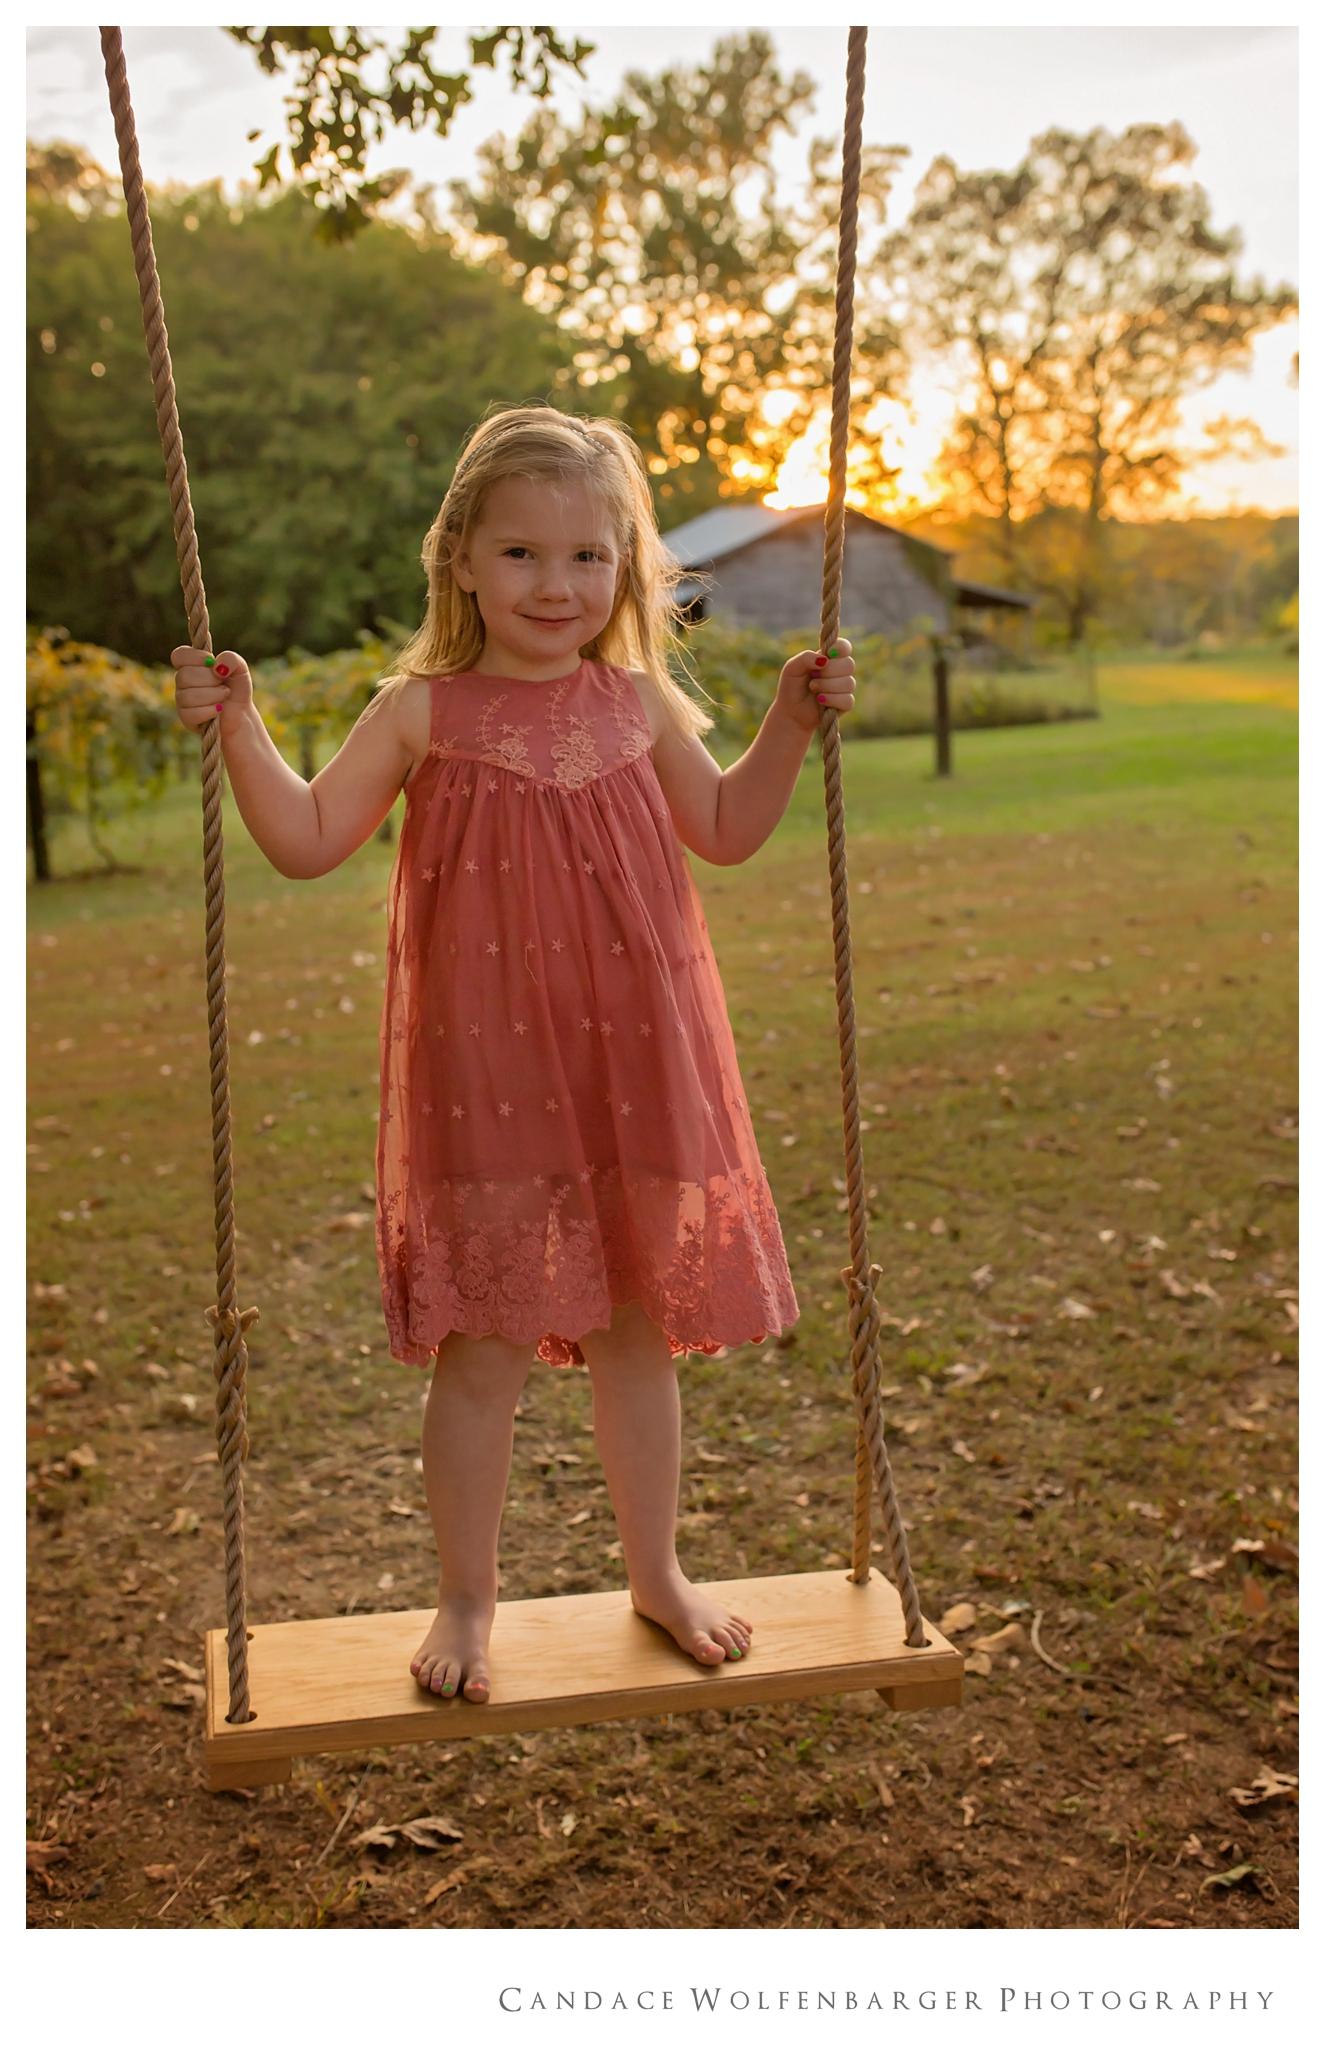 Naaman Caroline Swing Session Candace Wolfenbarger Sanford NC Childrens Photographer 10.jpg